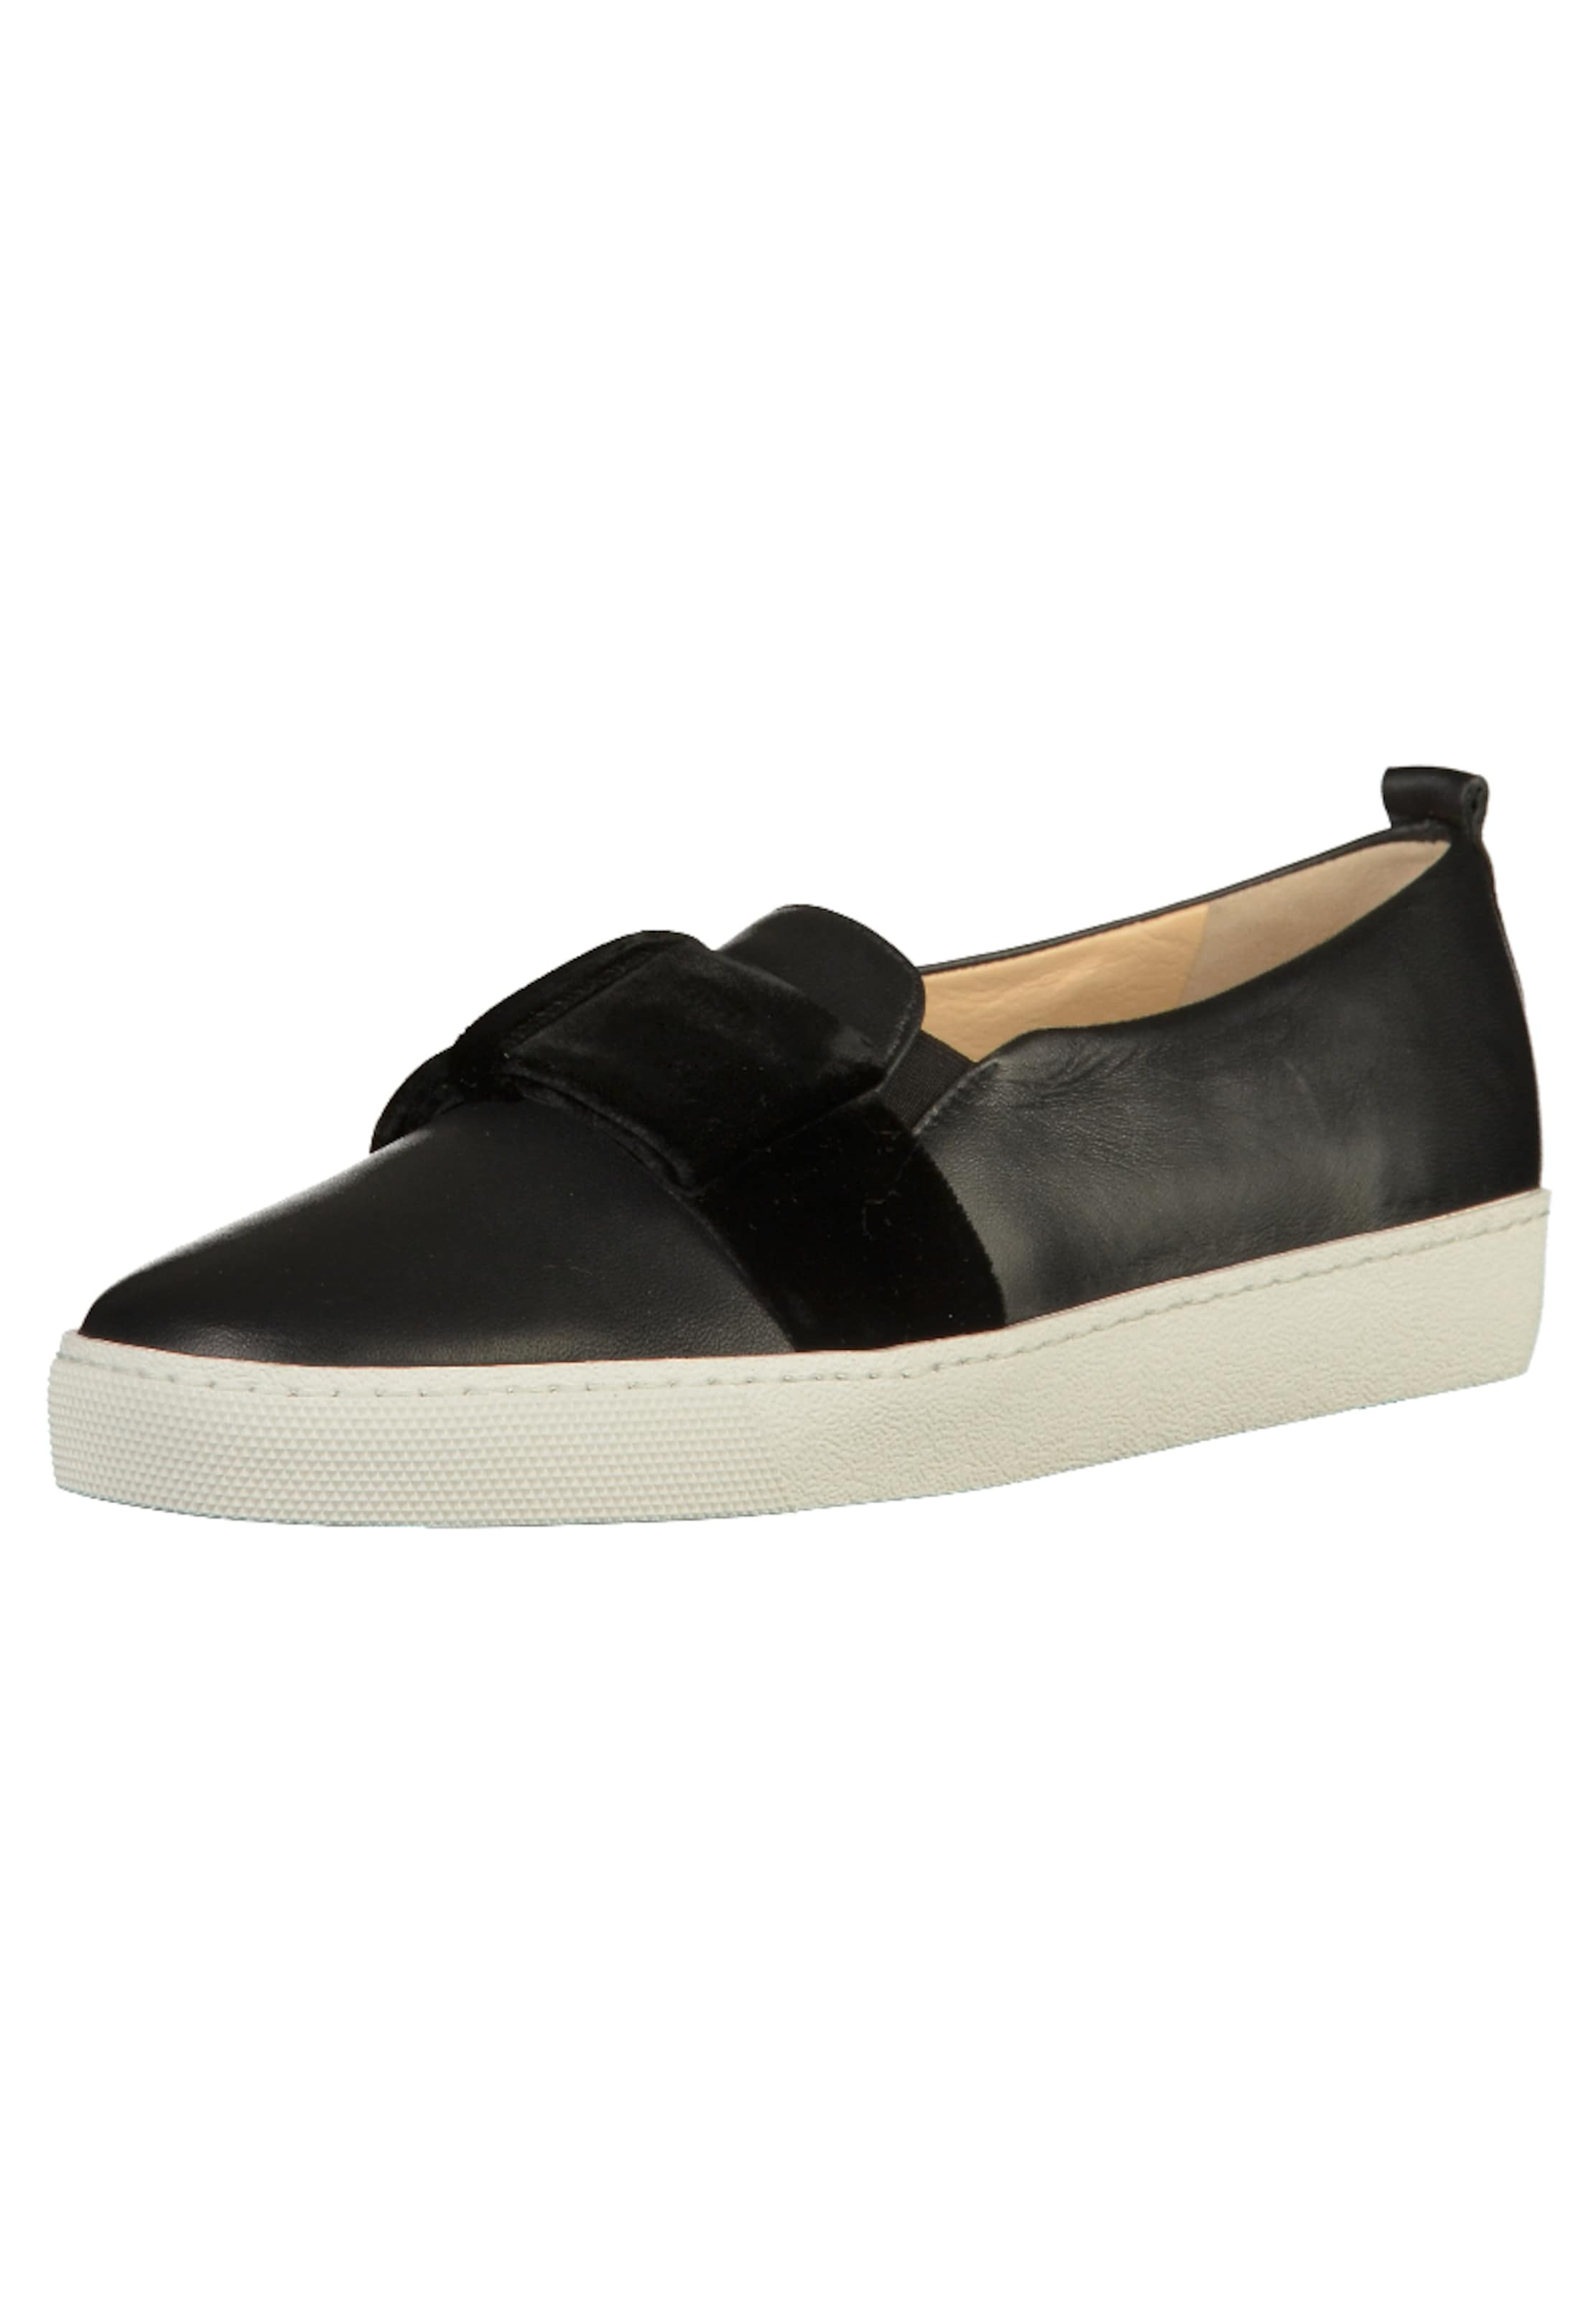 Högl Slipper Günstige und langlebige Schuhe